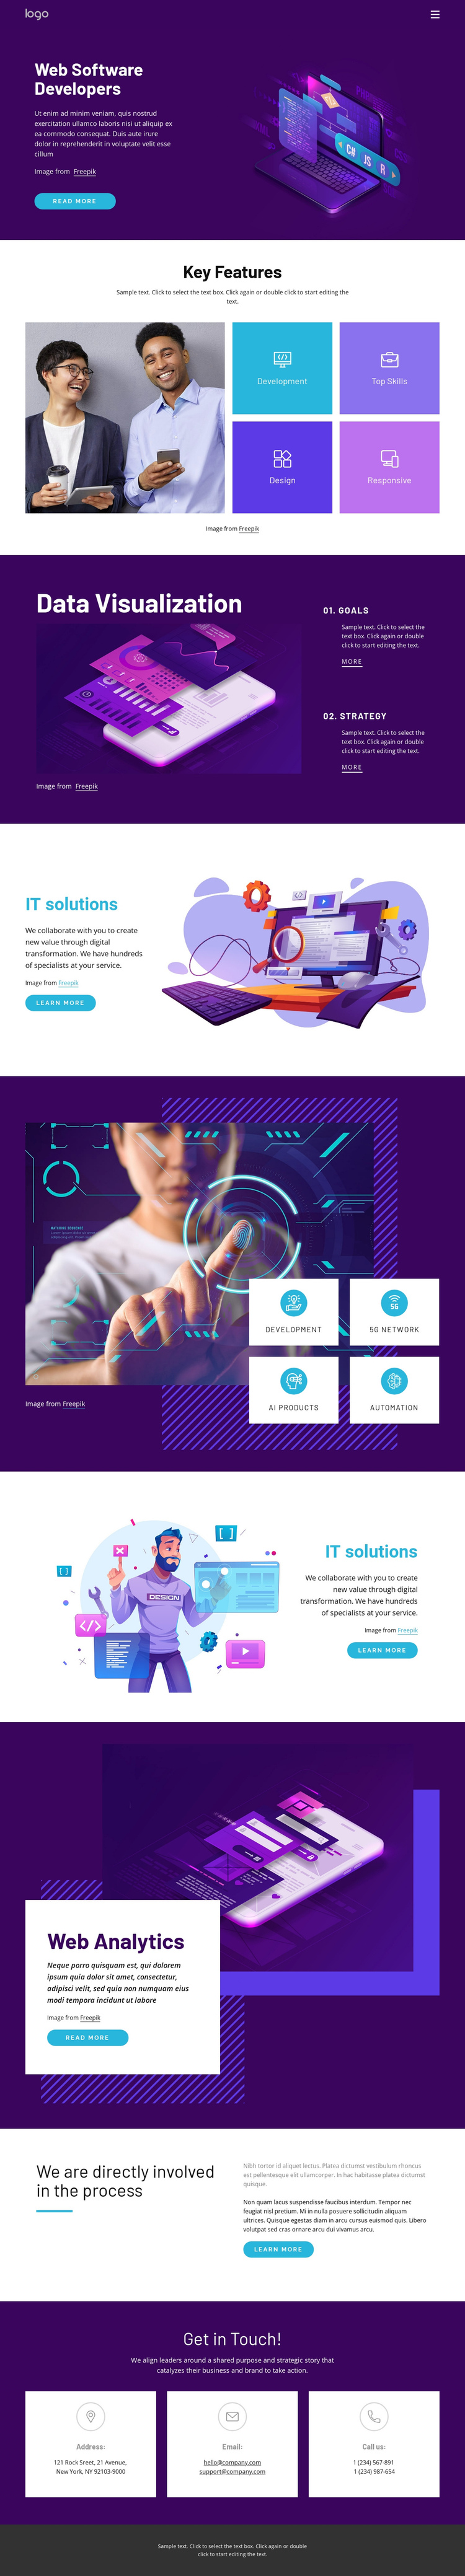 Solutions improve productivity Website Builder Software